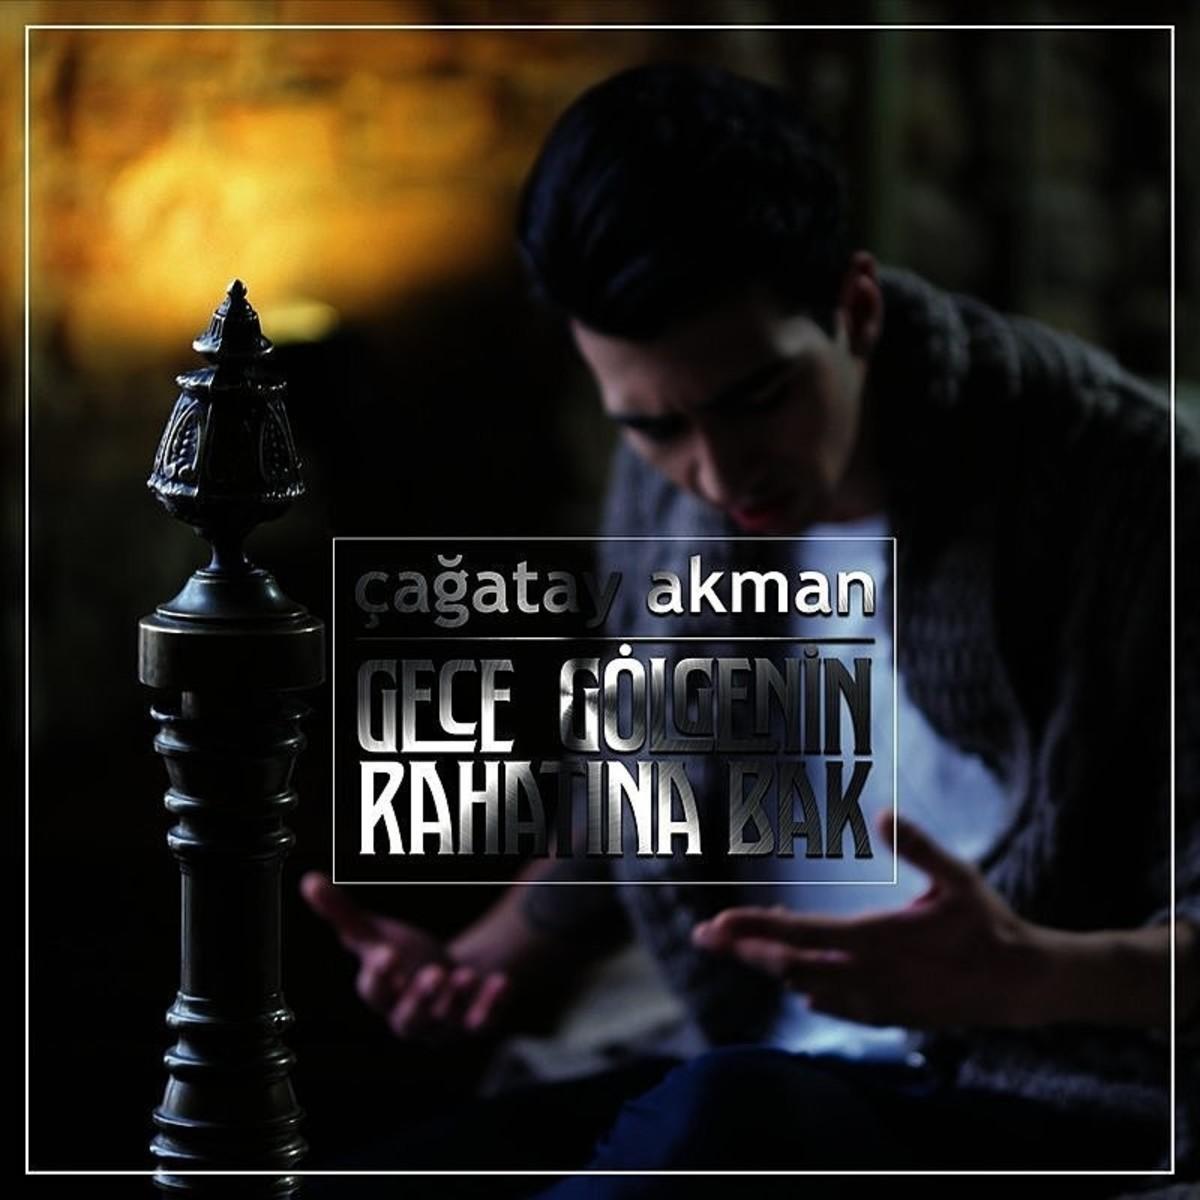 Gece Golgenin Rahatina Bak Mp3 Song Download Gece Golgenin